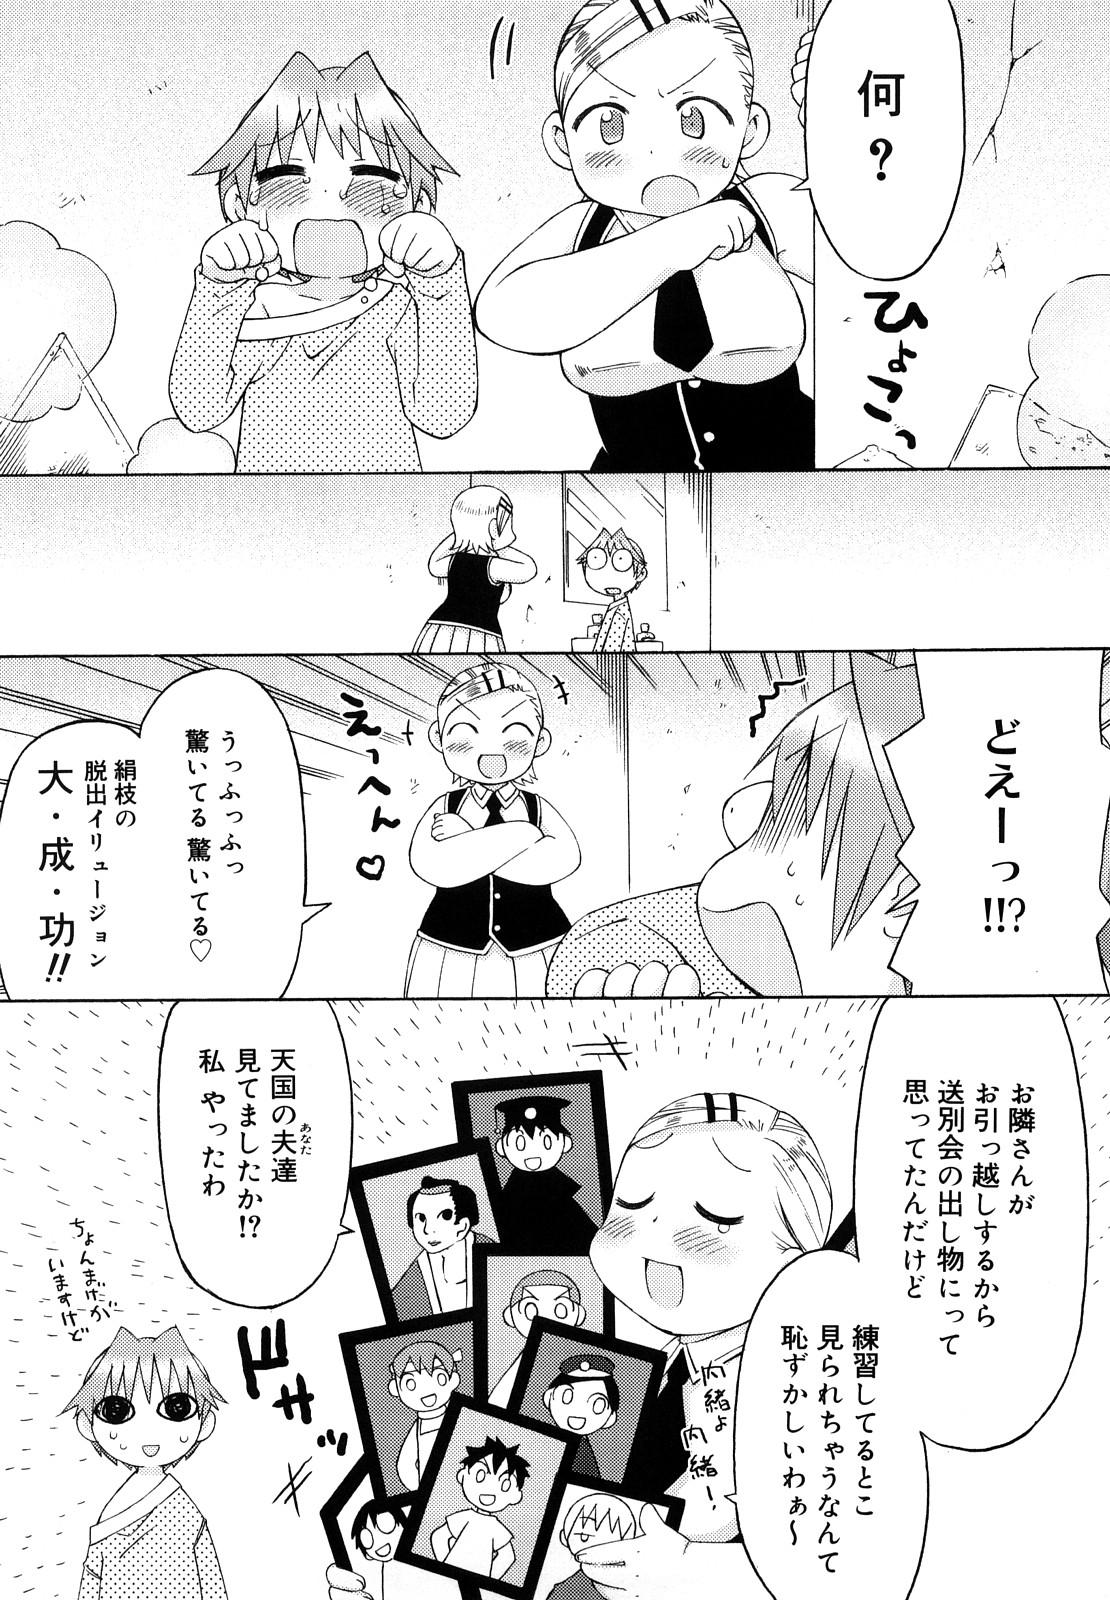 Hatsuden Pandakun! Shinsouban 177